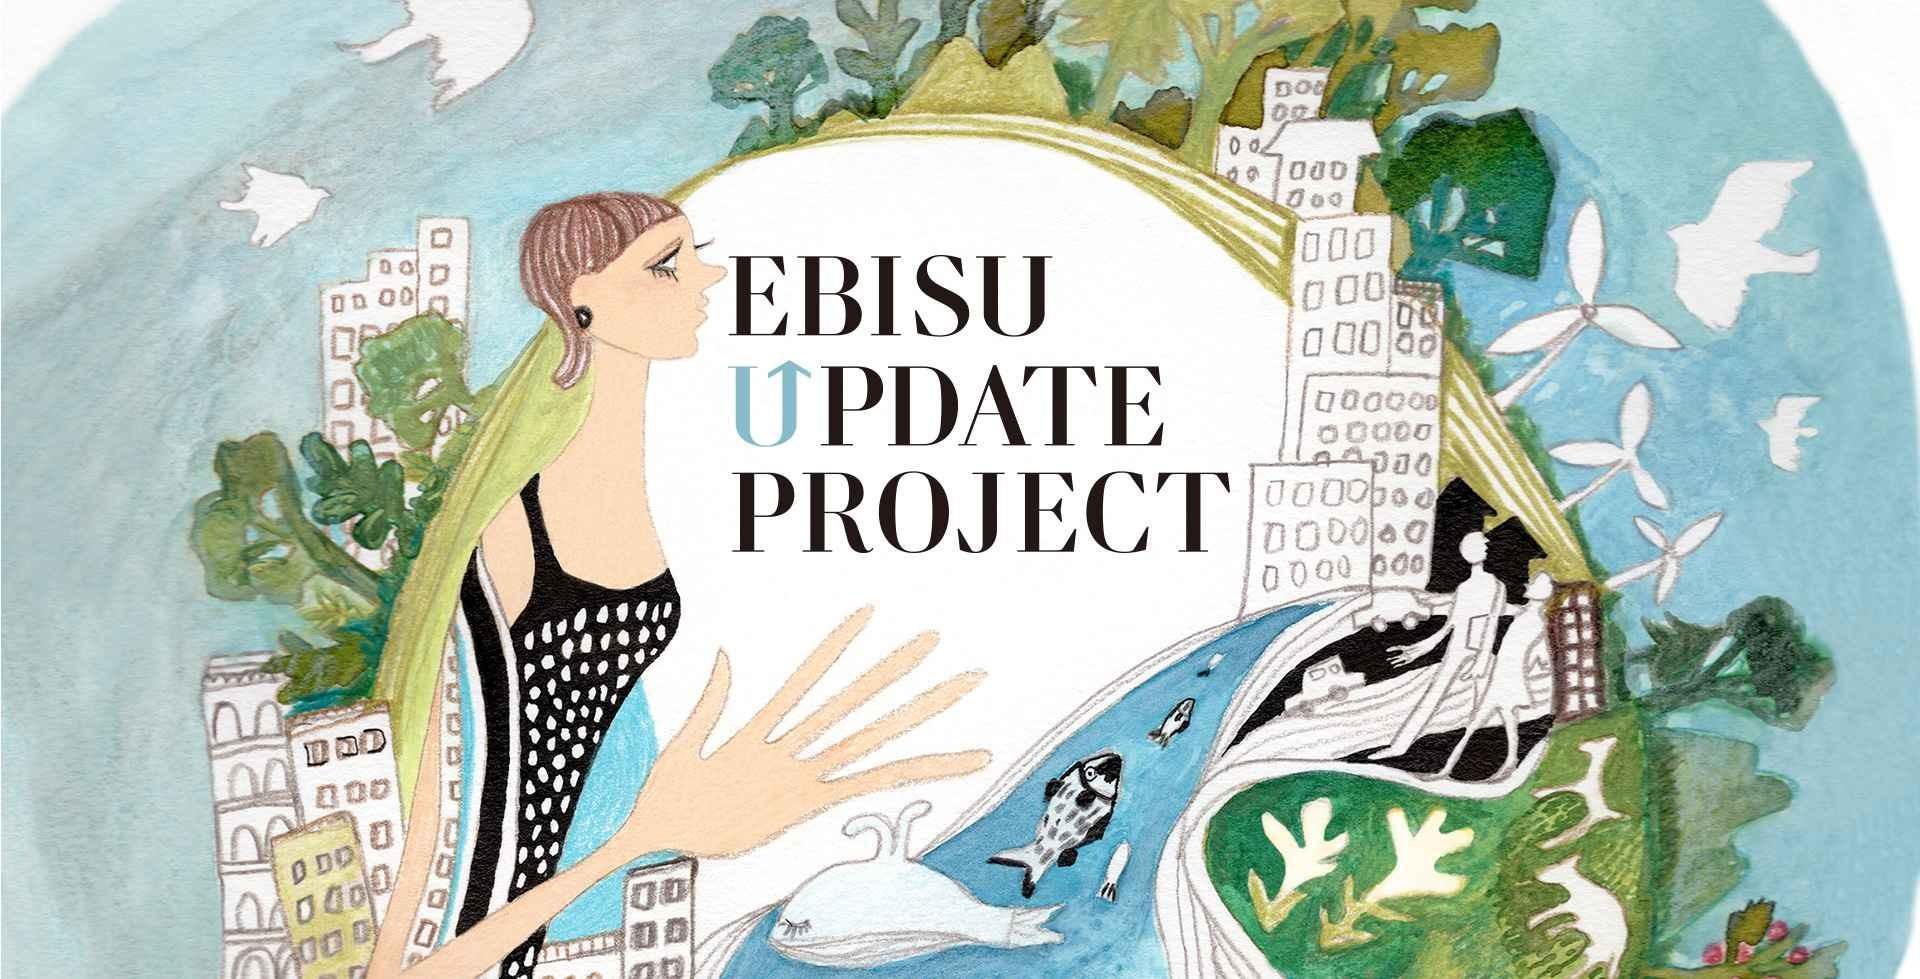 FRaU x EBISU UPDATE PROJECTスペシャル講座